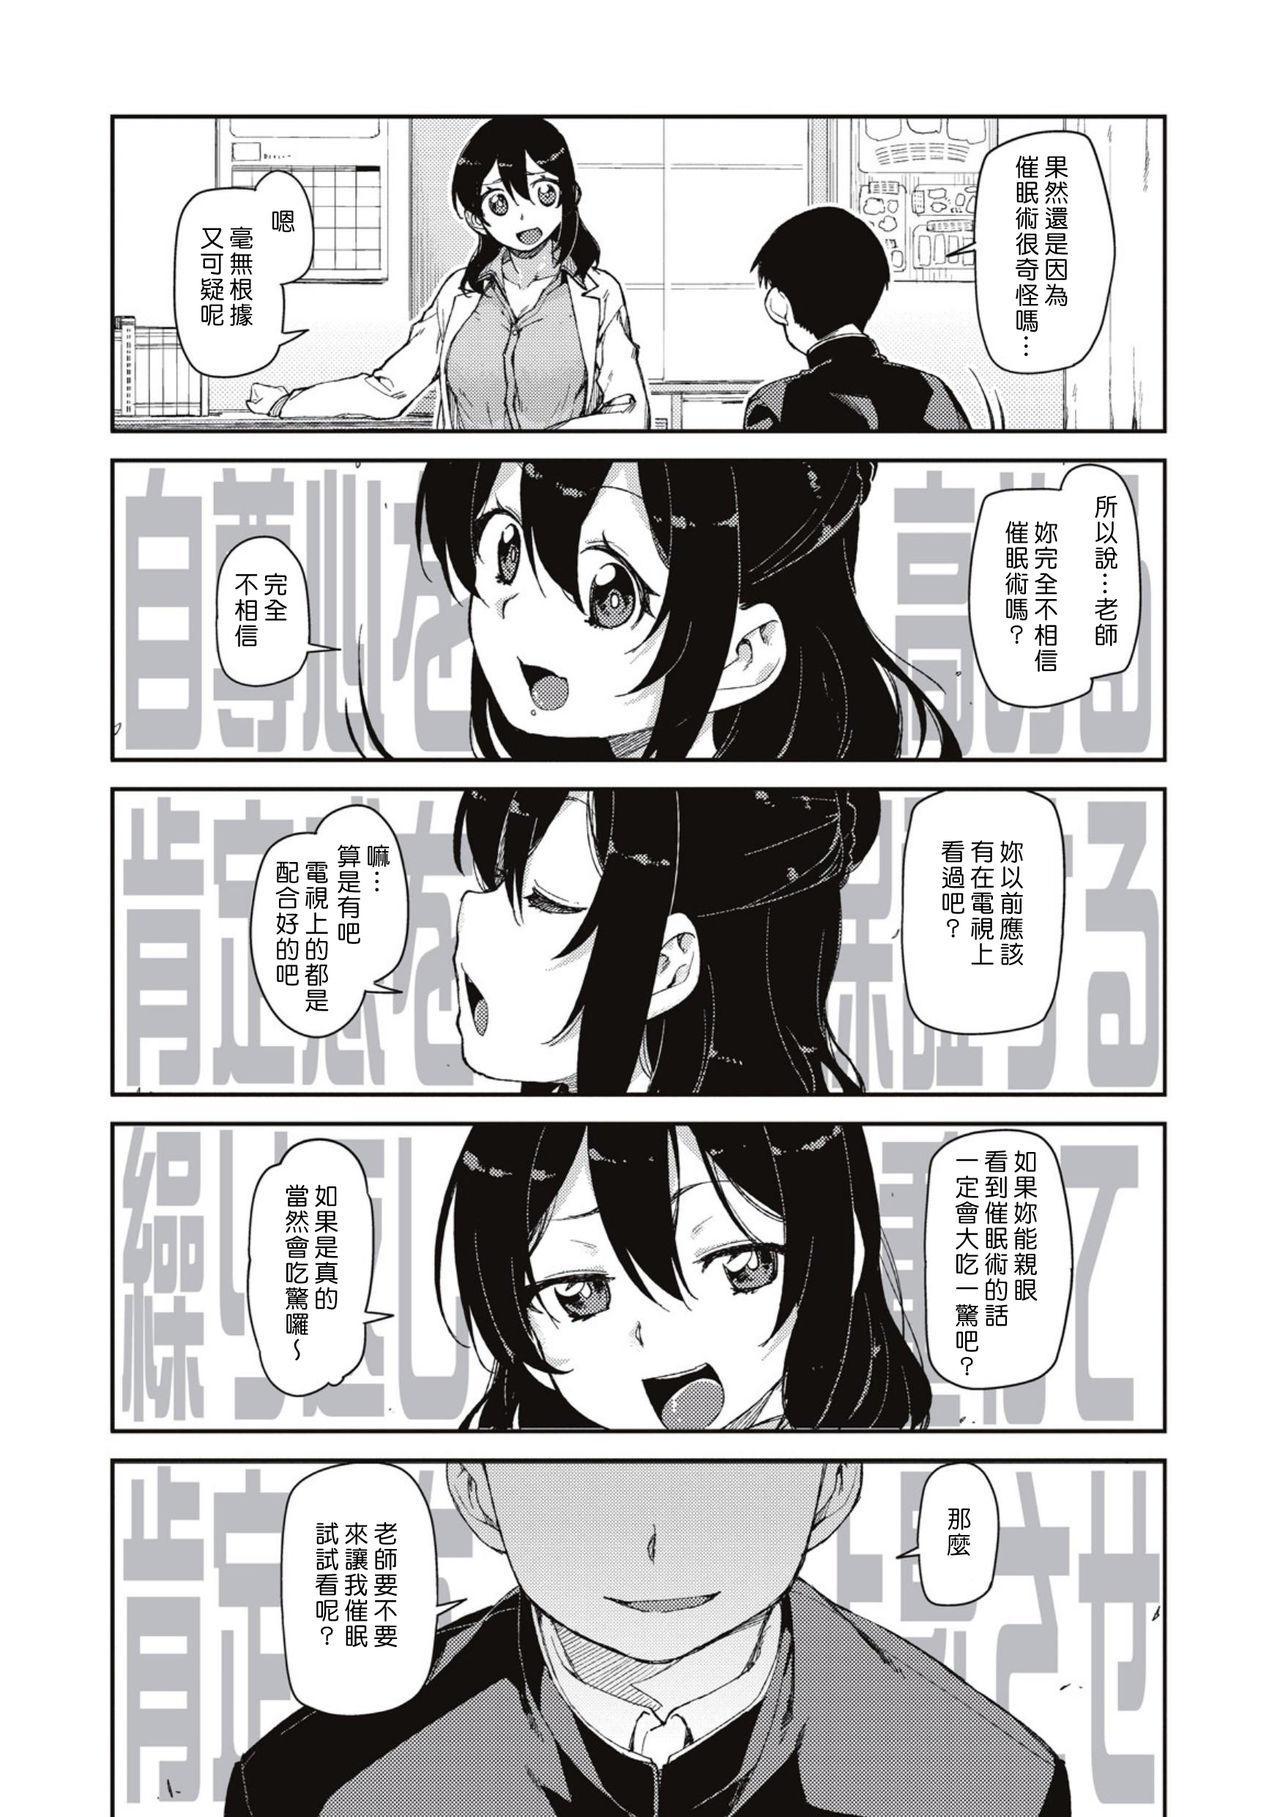 Himitsu no onedari 1